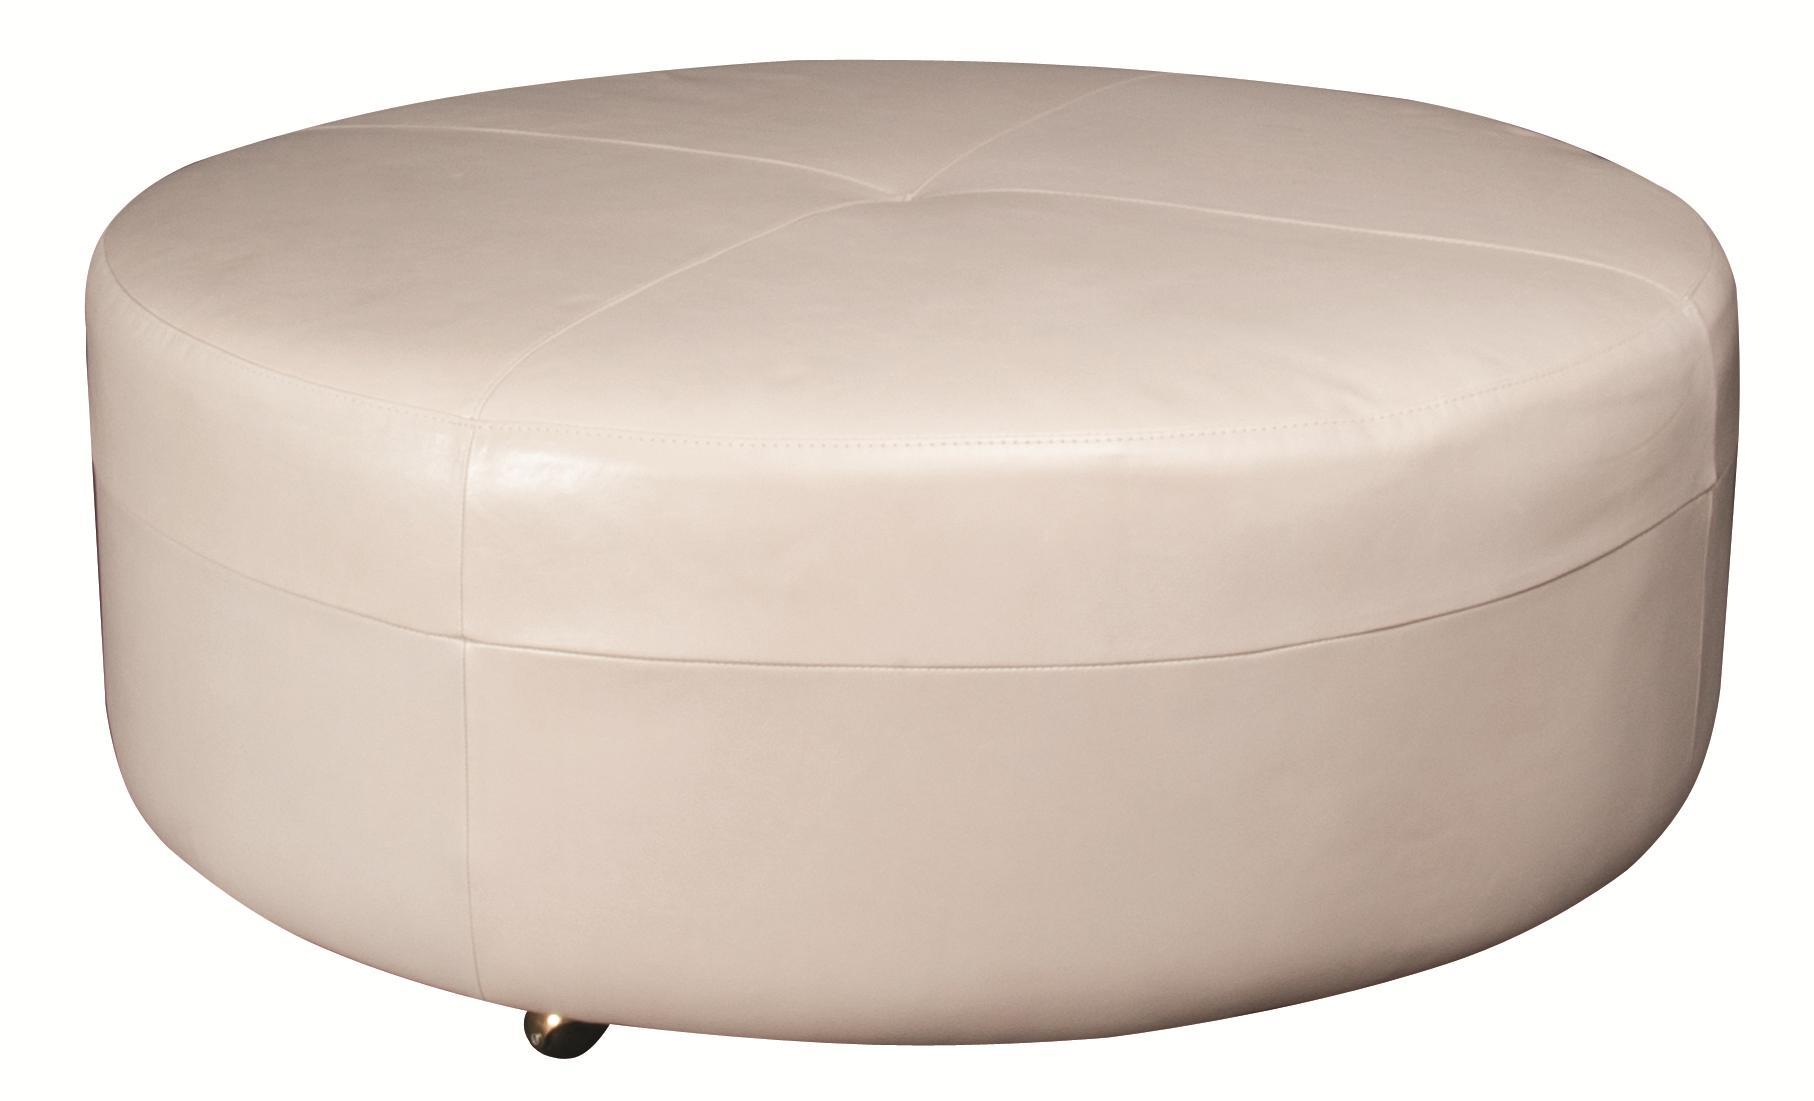 Morris Home Furnishings Alaina Alaina 100% Leather Ottoman - Item Number: 145133358